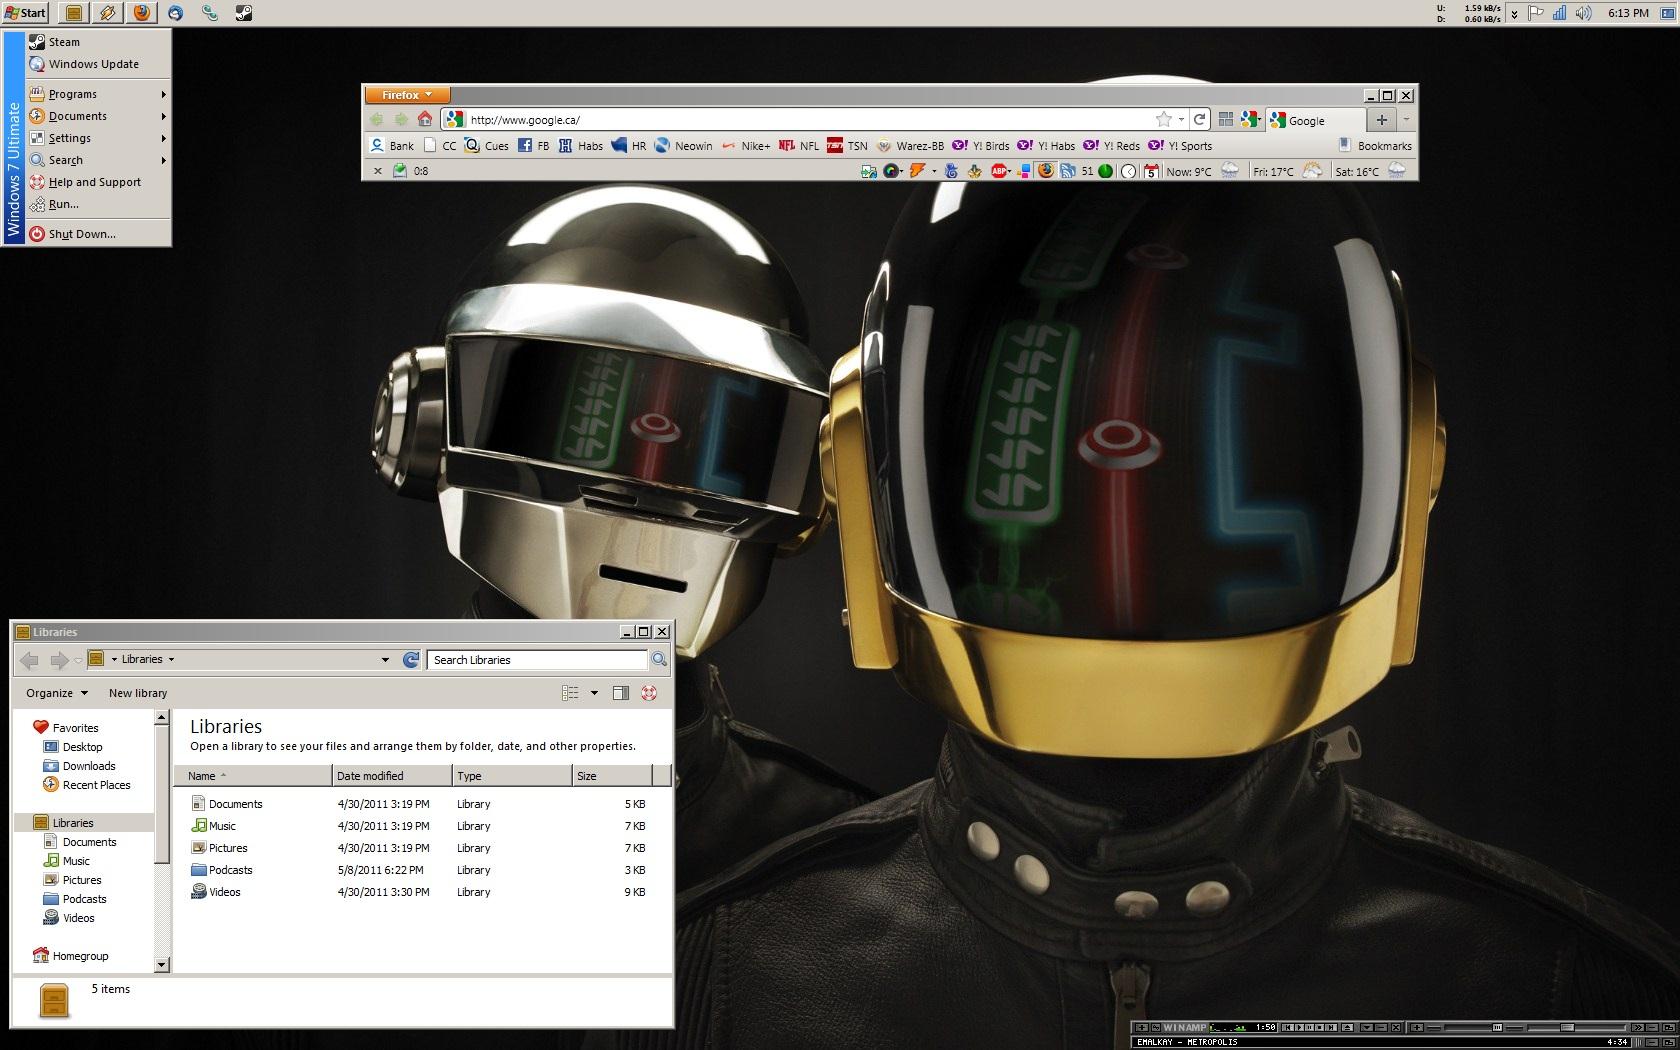 desktopwin.jpg